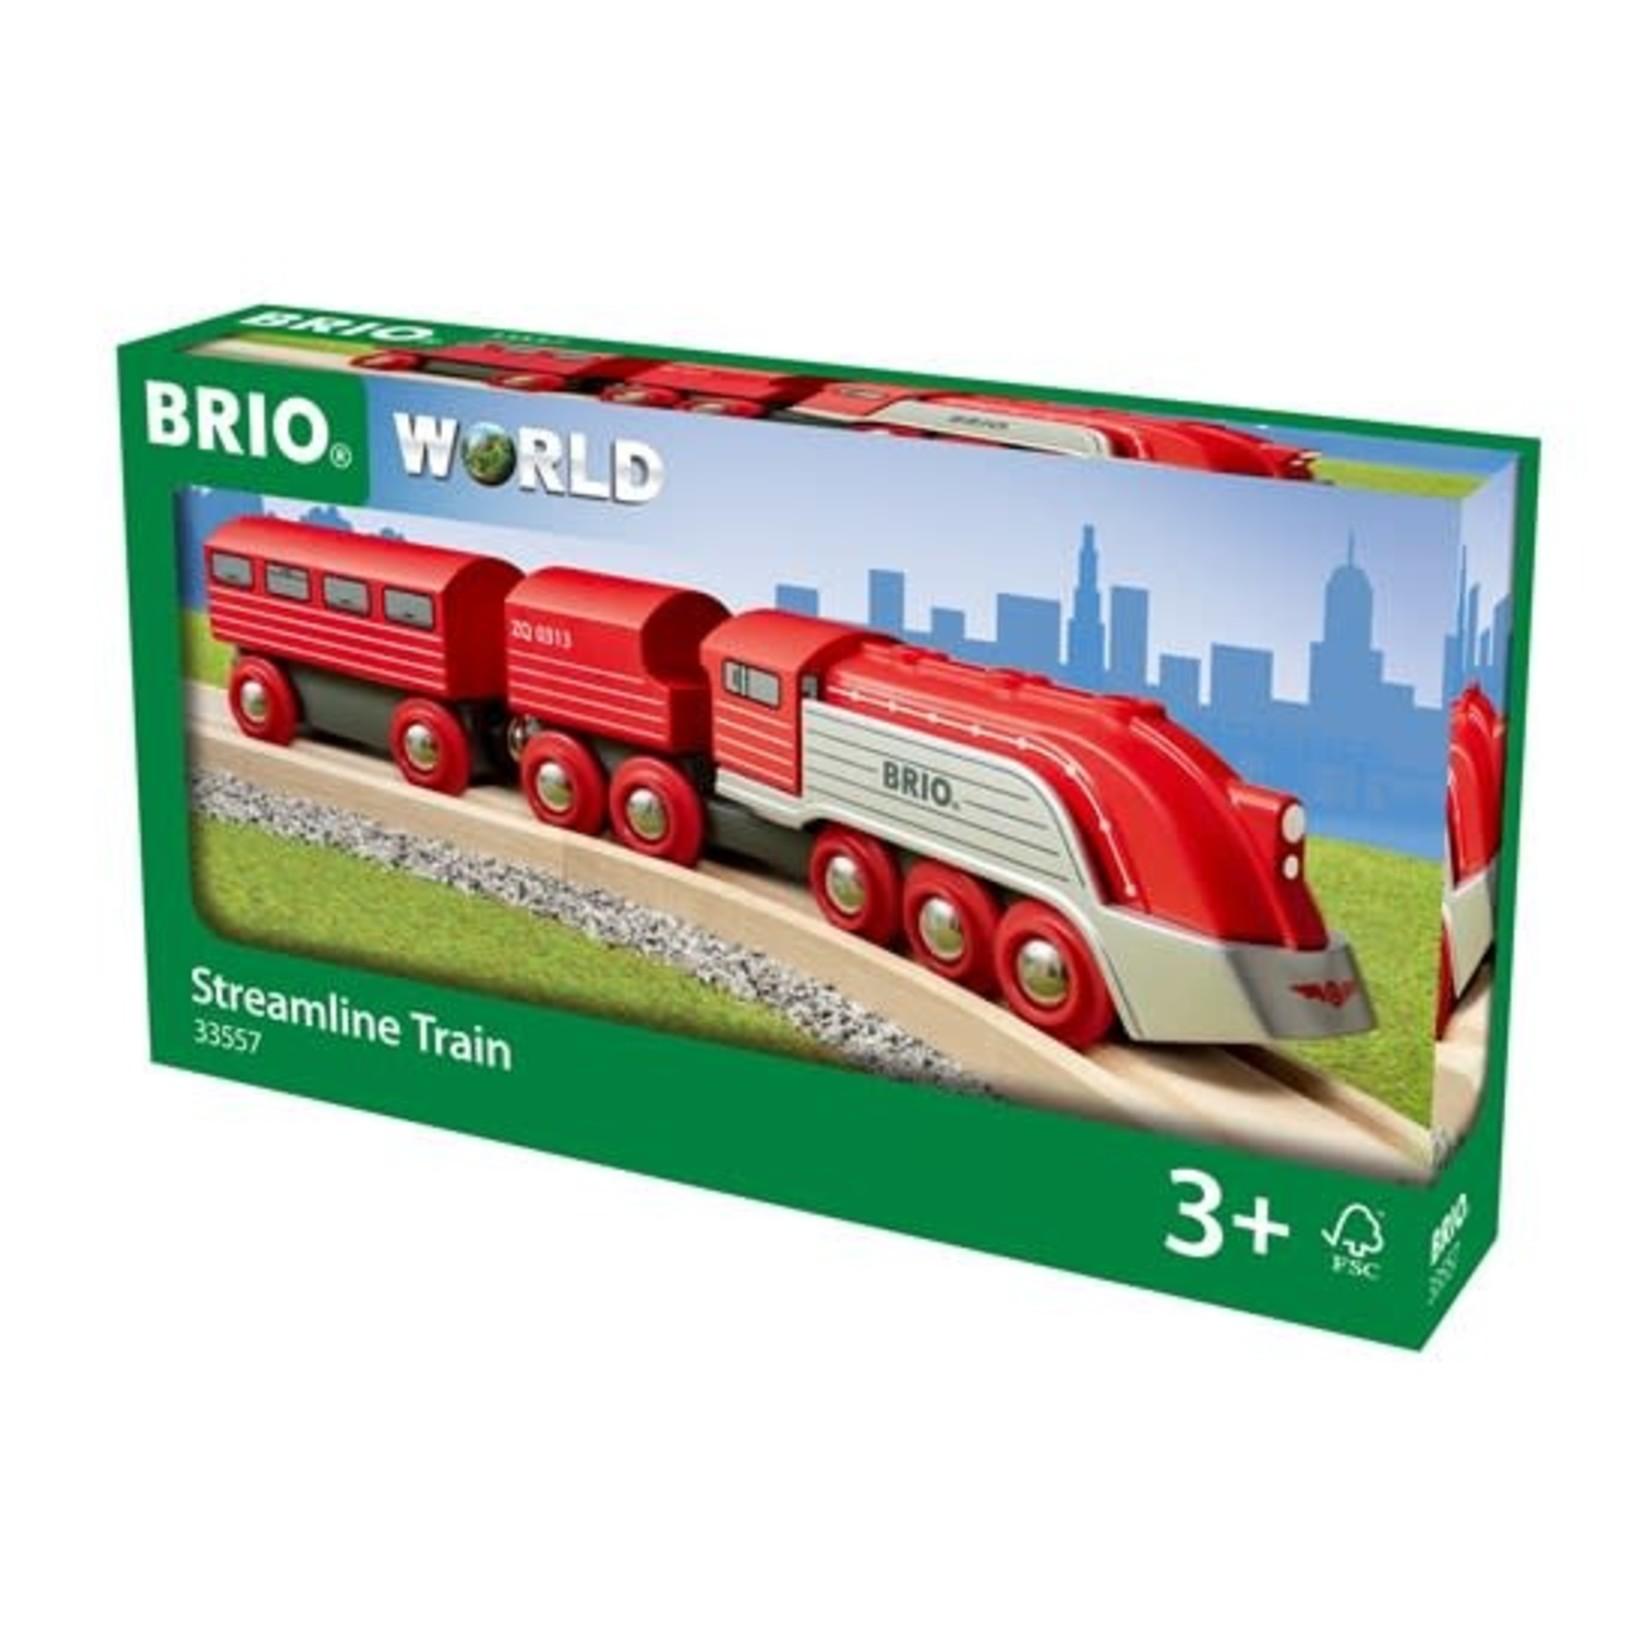 BRIO 33557 STREAMLINE TRAIN